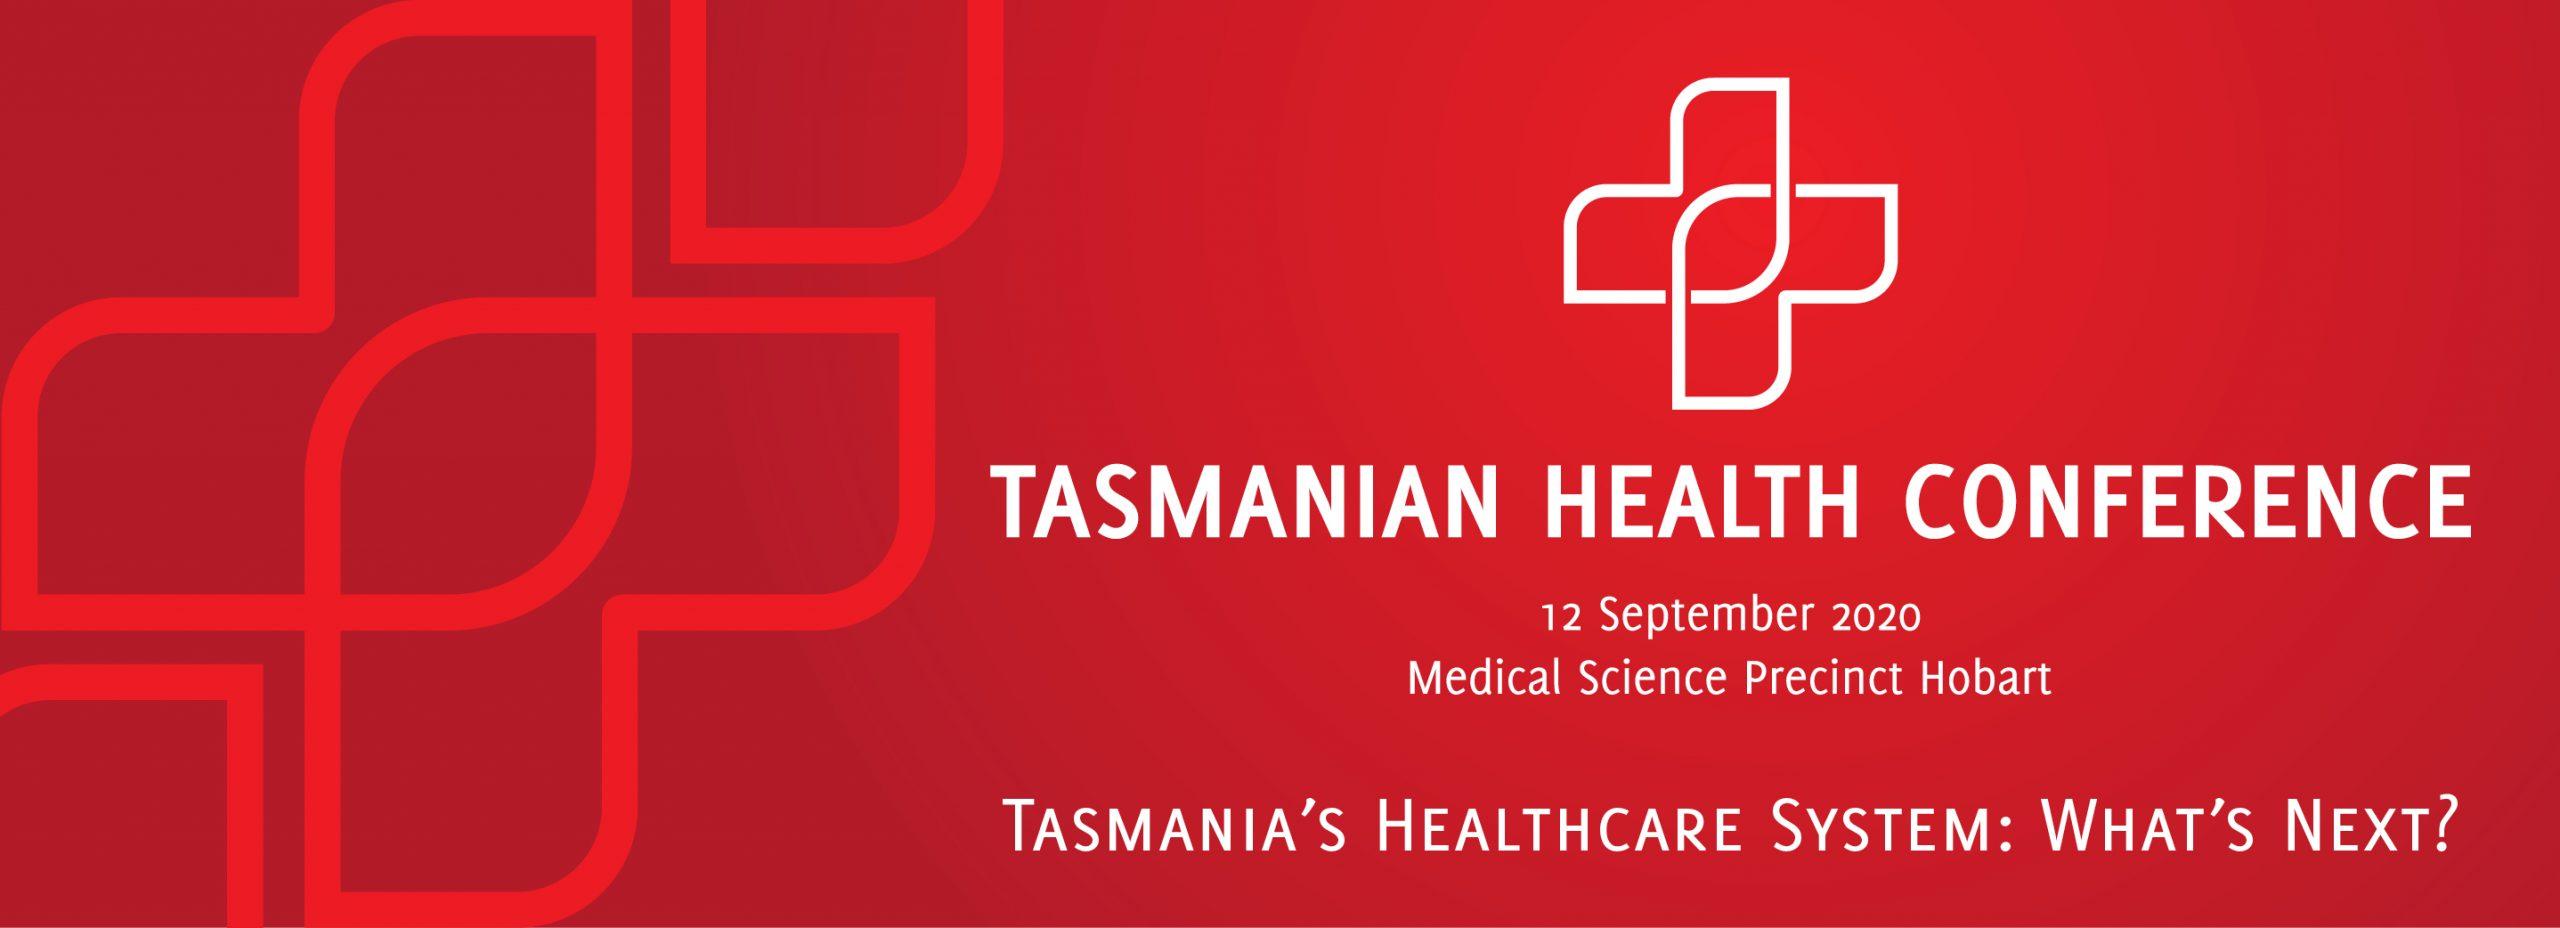 Tasmanian Health Conference